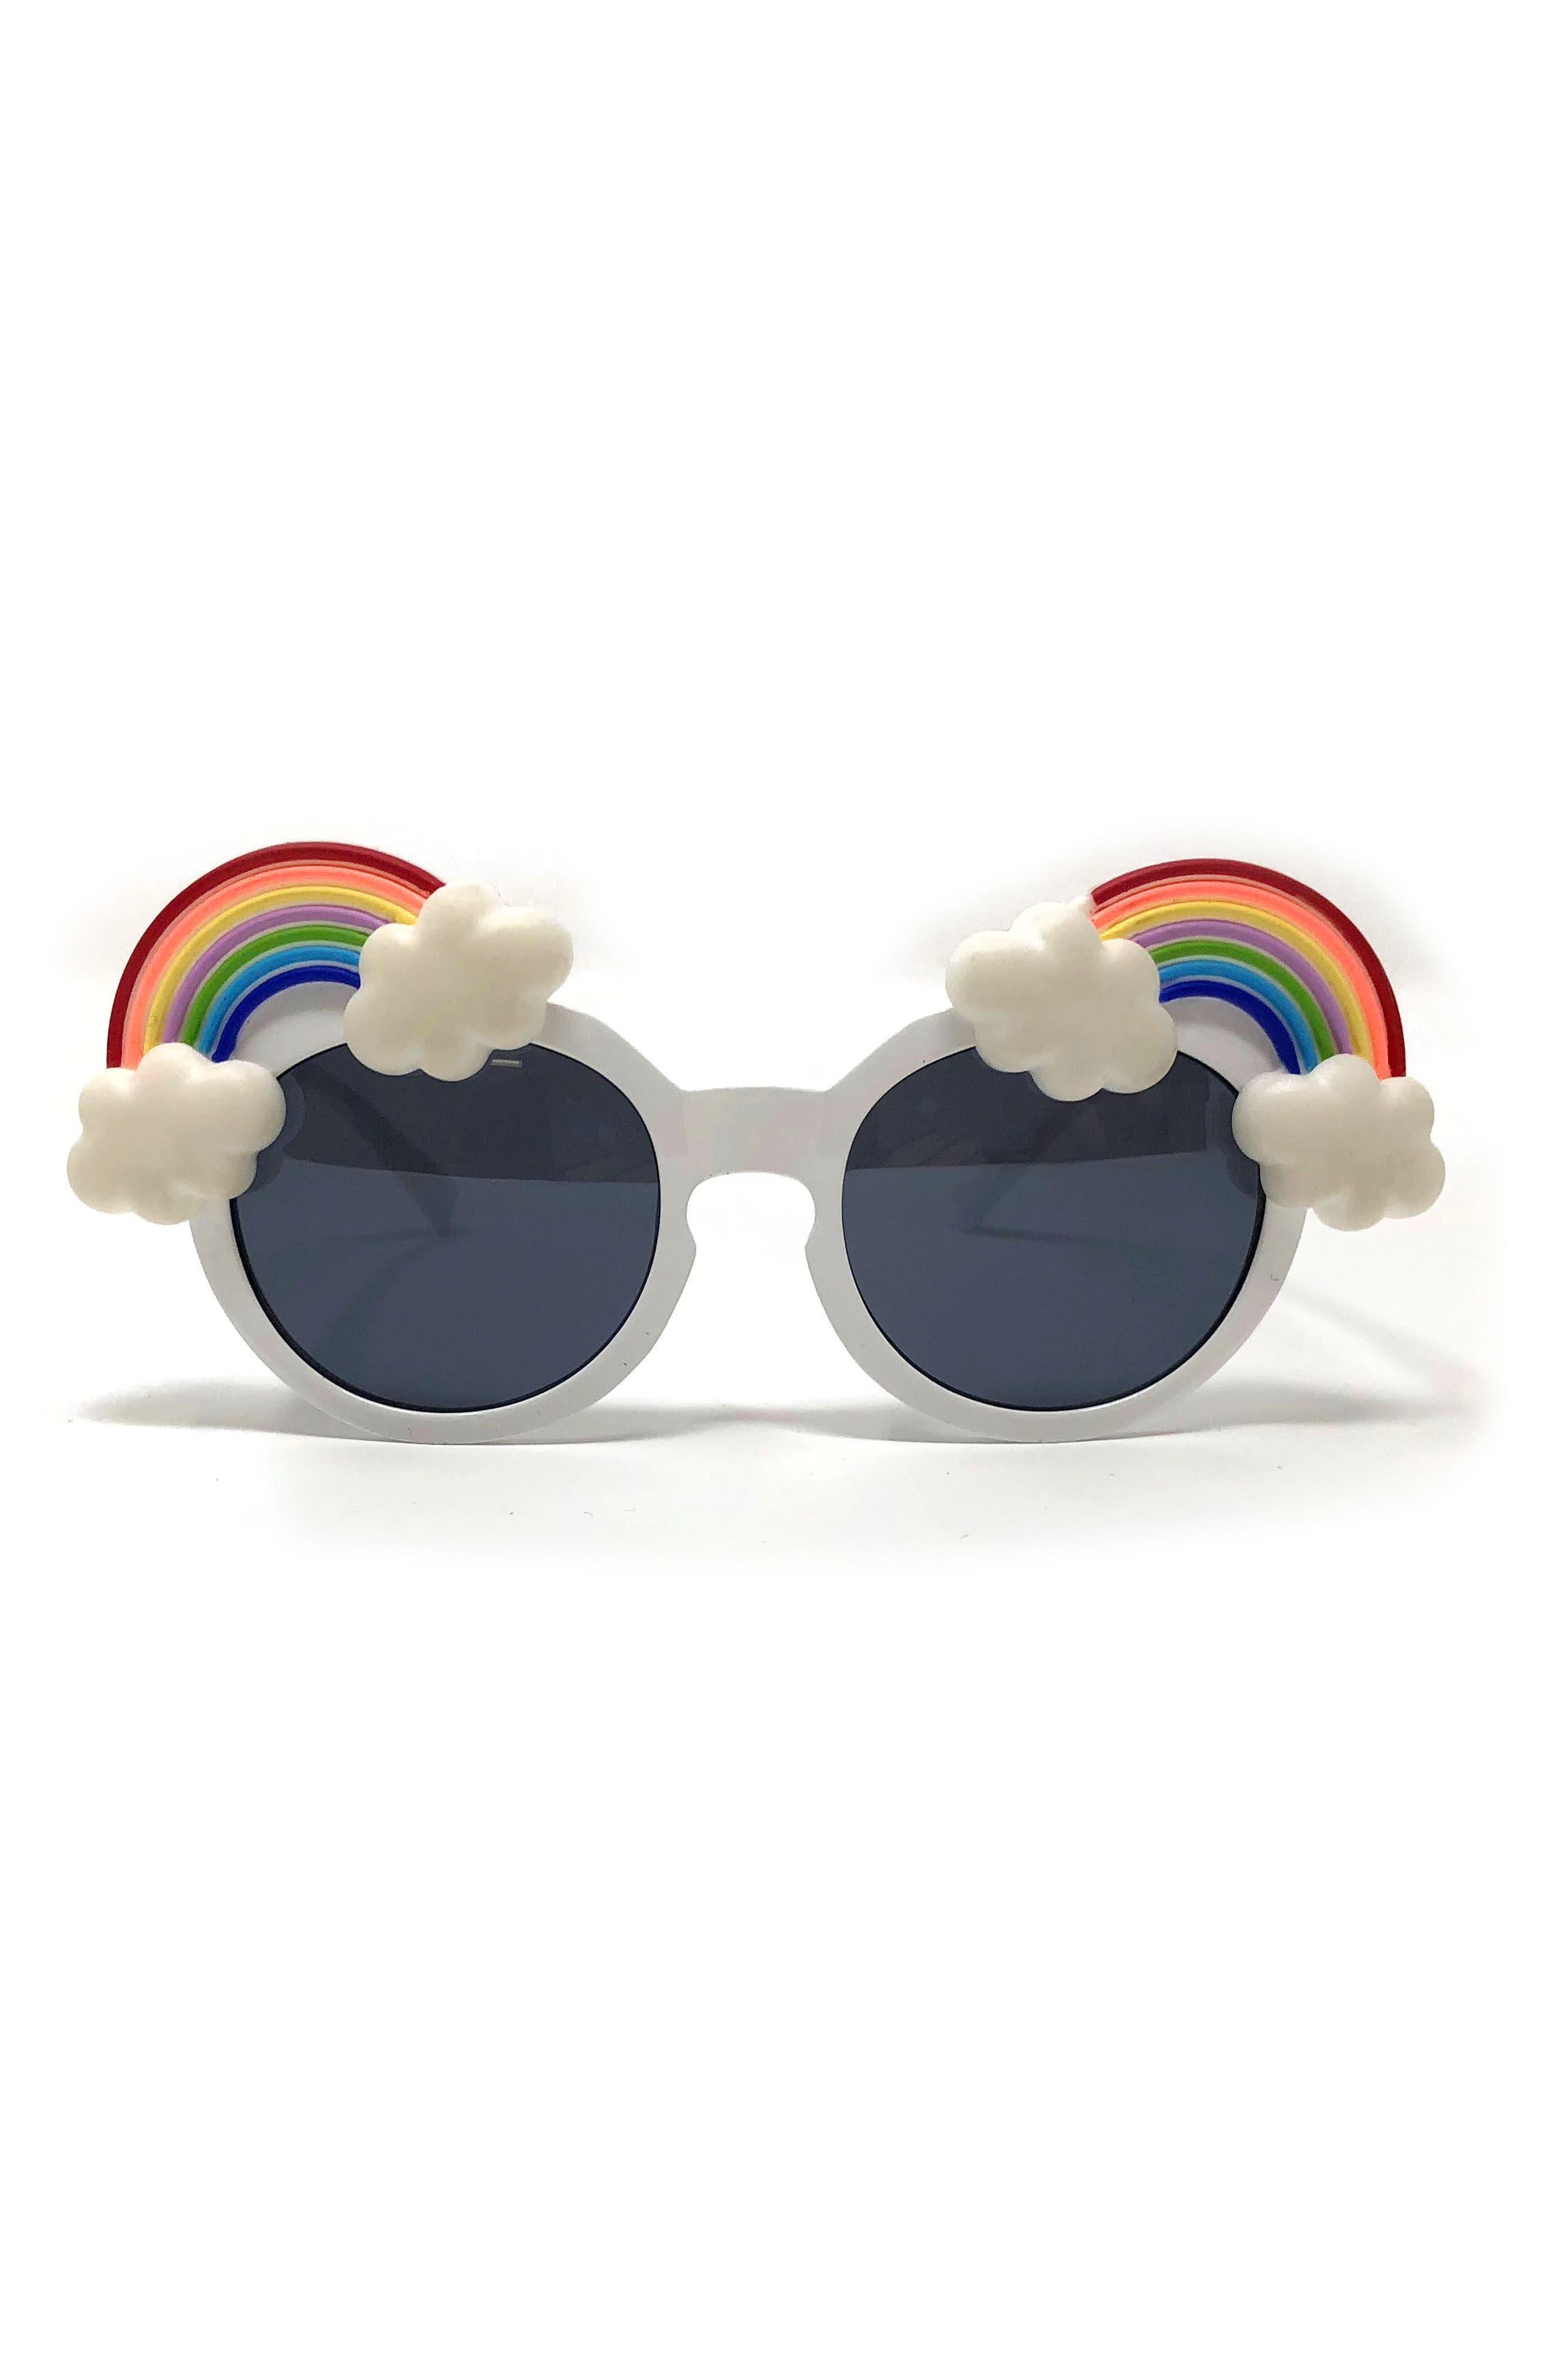 Small Round Rainbow Sunglasses,                         Main,                         color, White/Rainbow